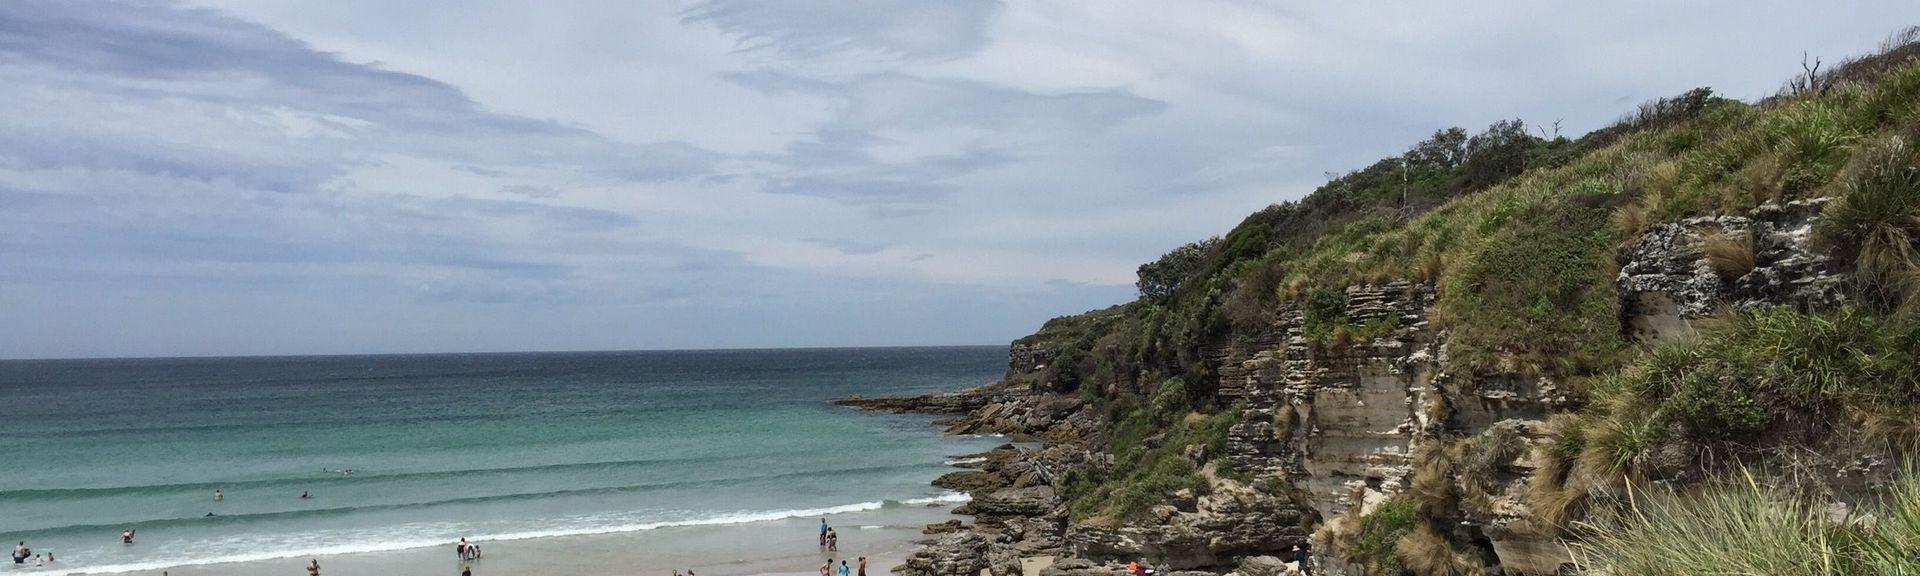 Jervis Bay, JBT, Australia